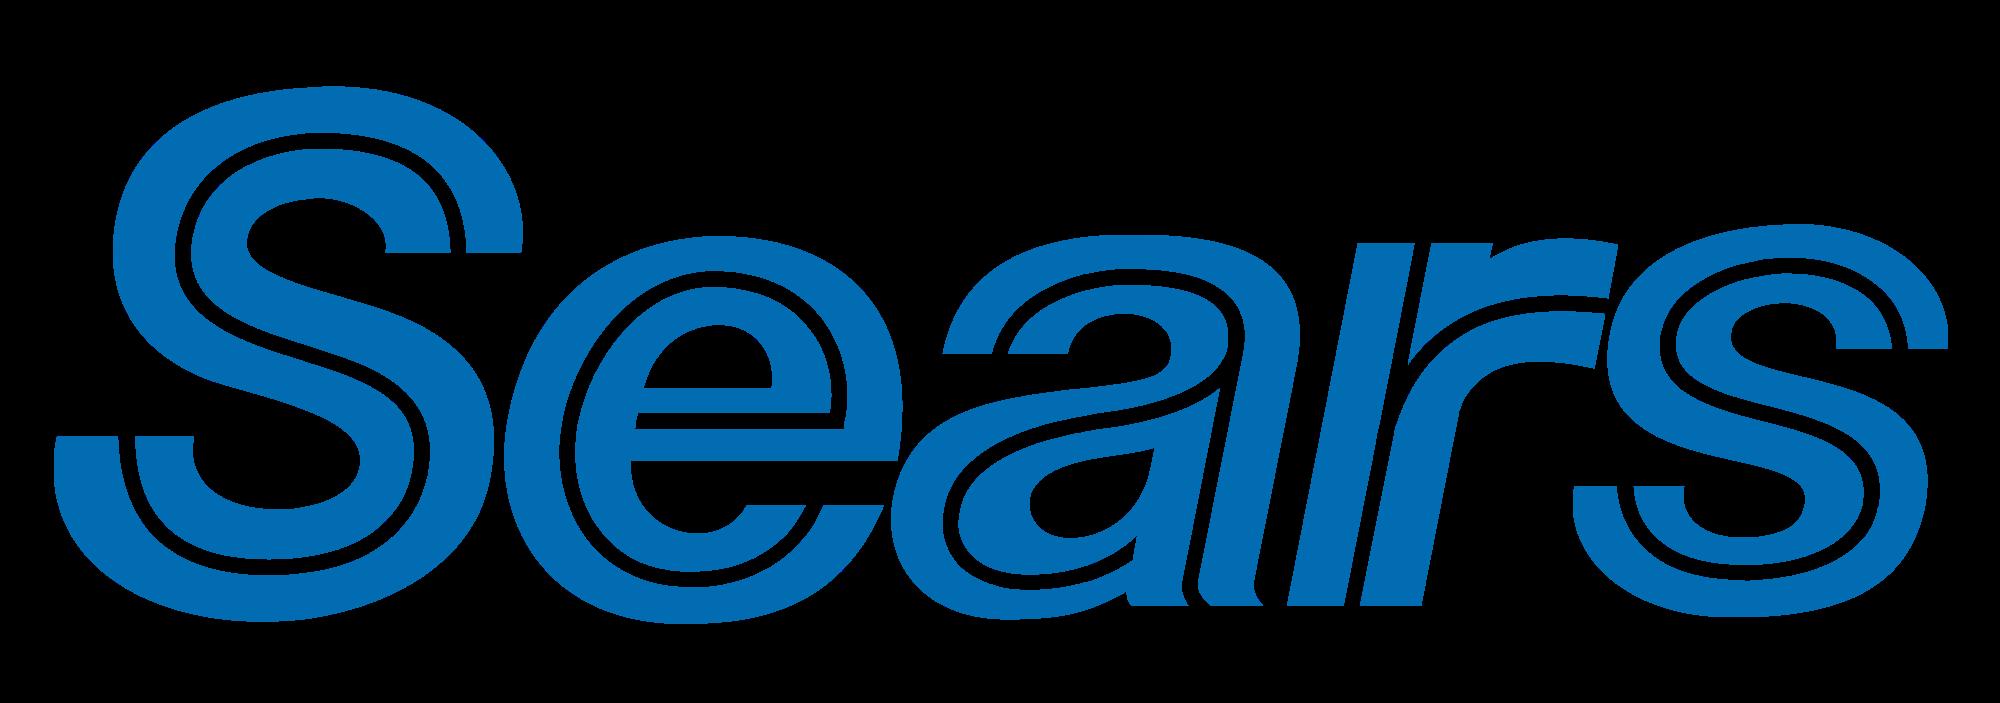 sears logo transparent Google Search Sears home